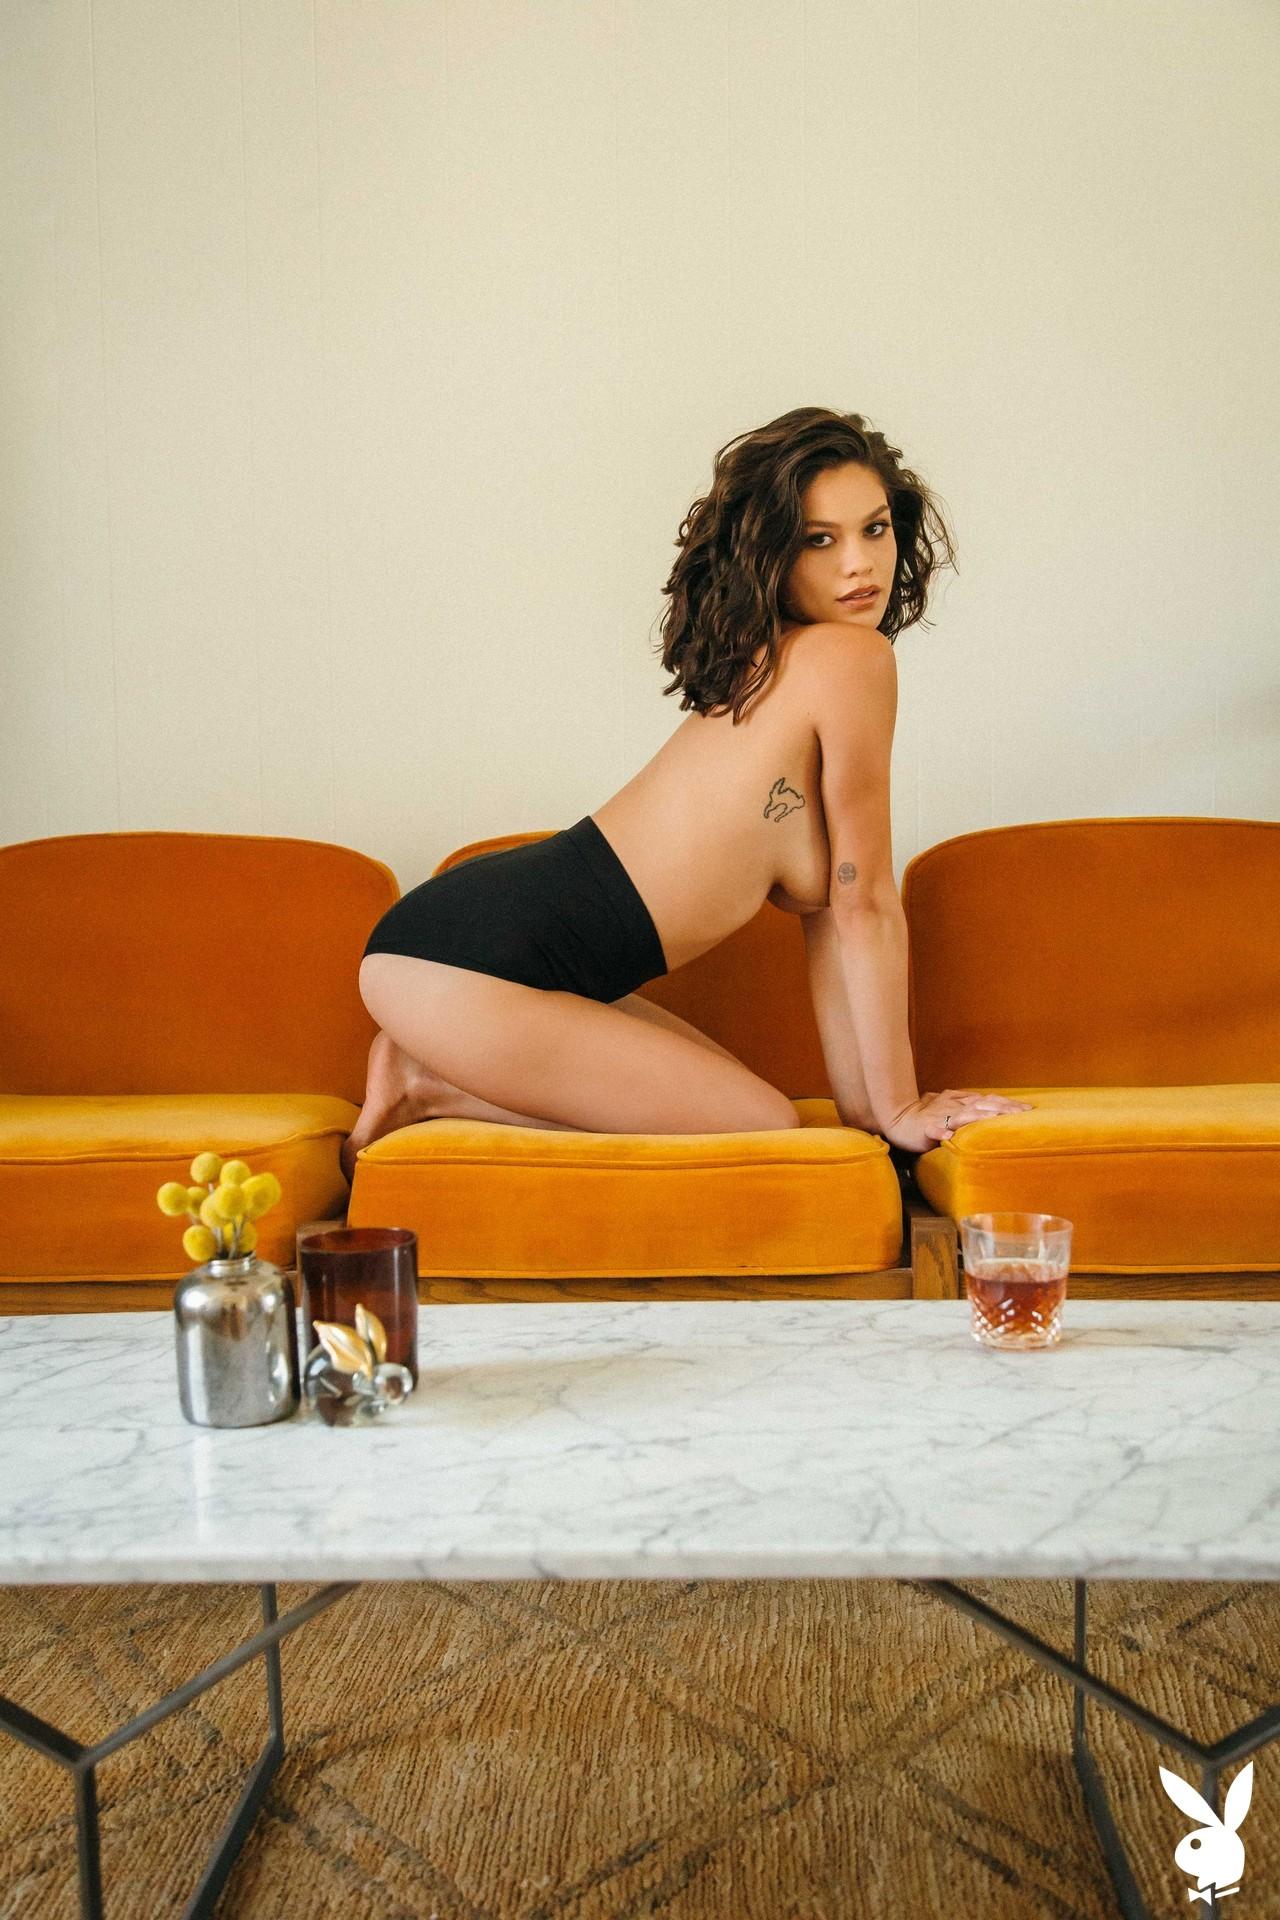 Natalie Del Real In The Simple Things Playboy Plus (11)